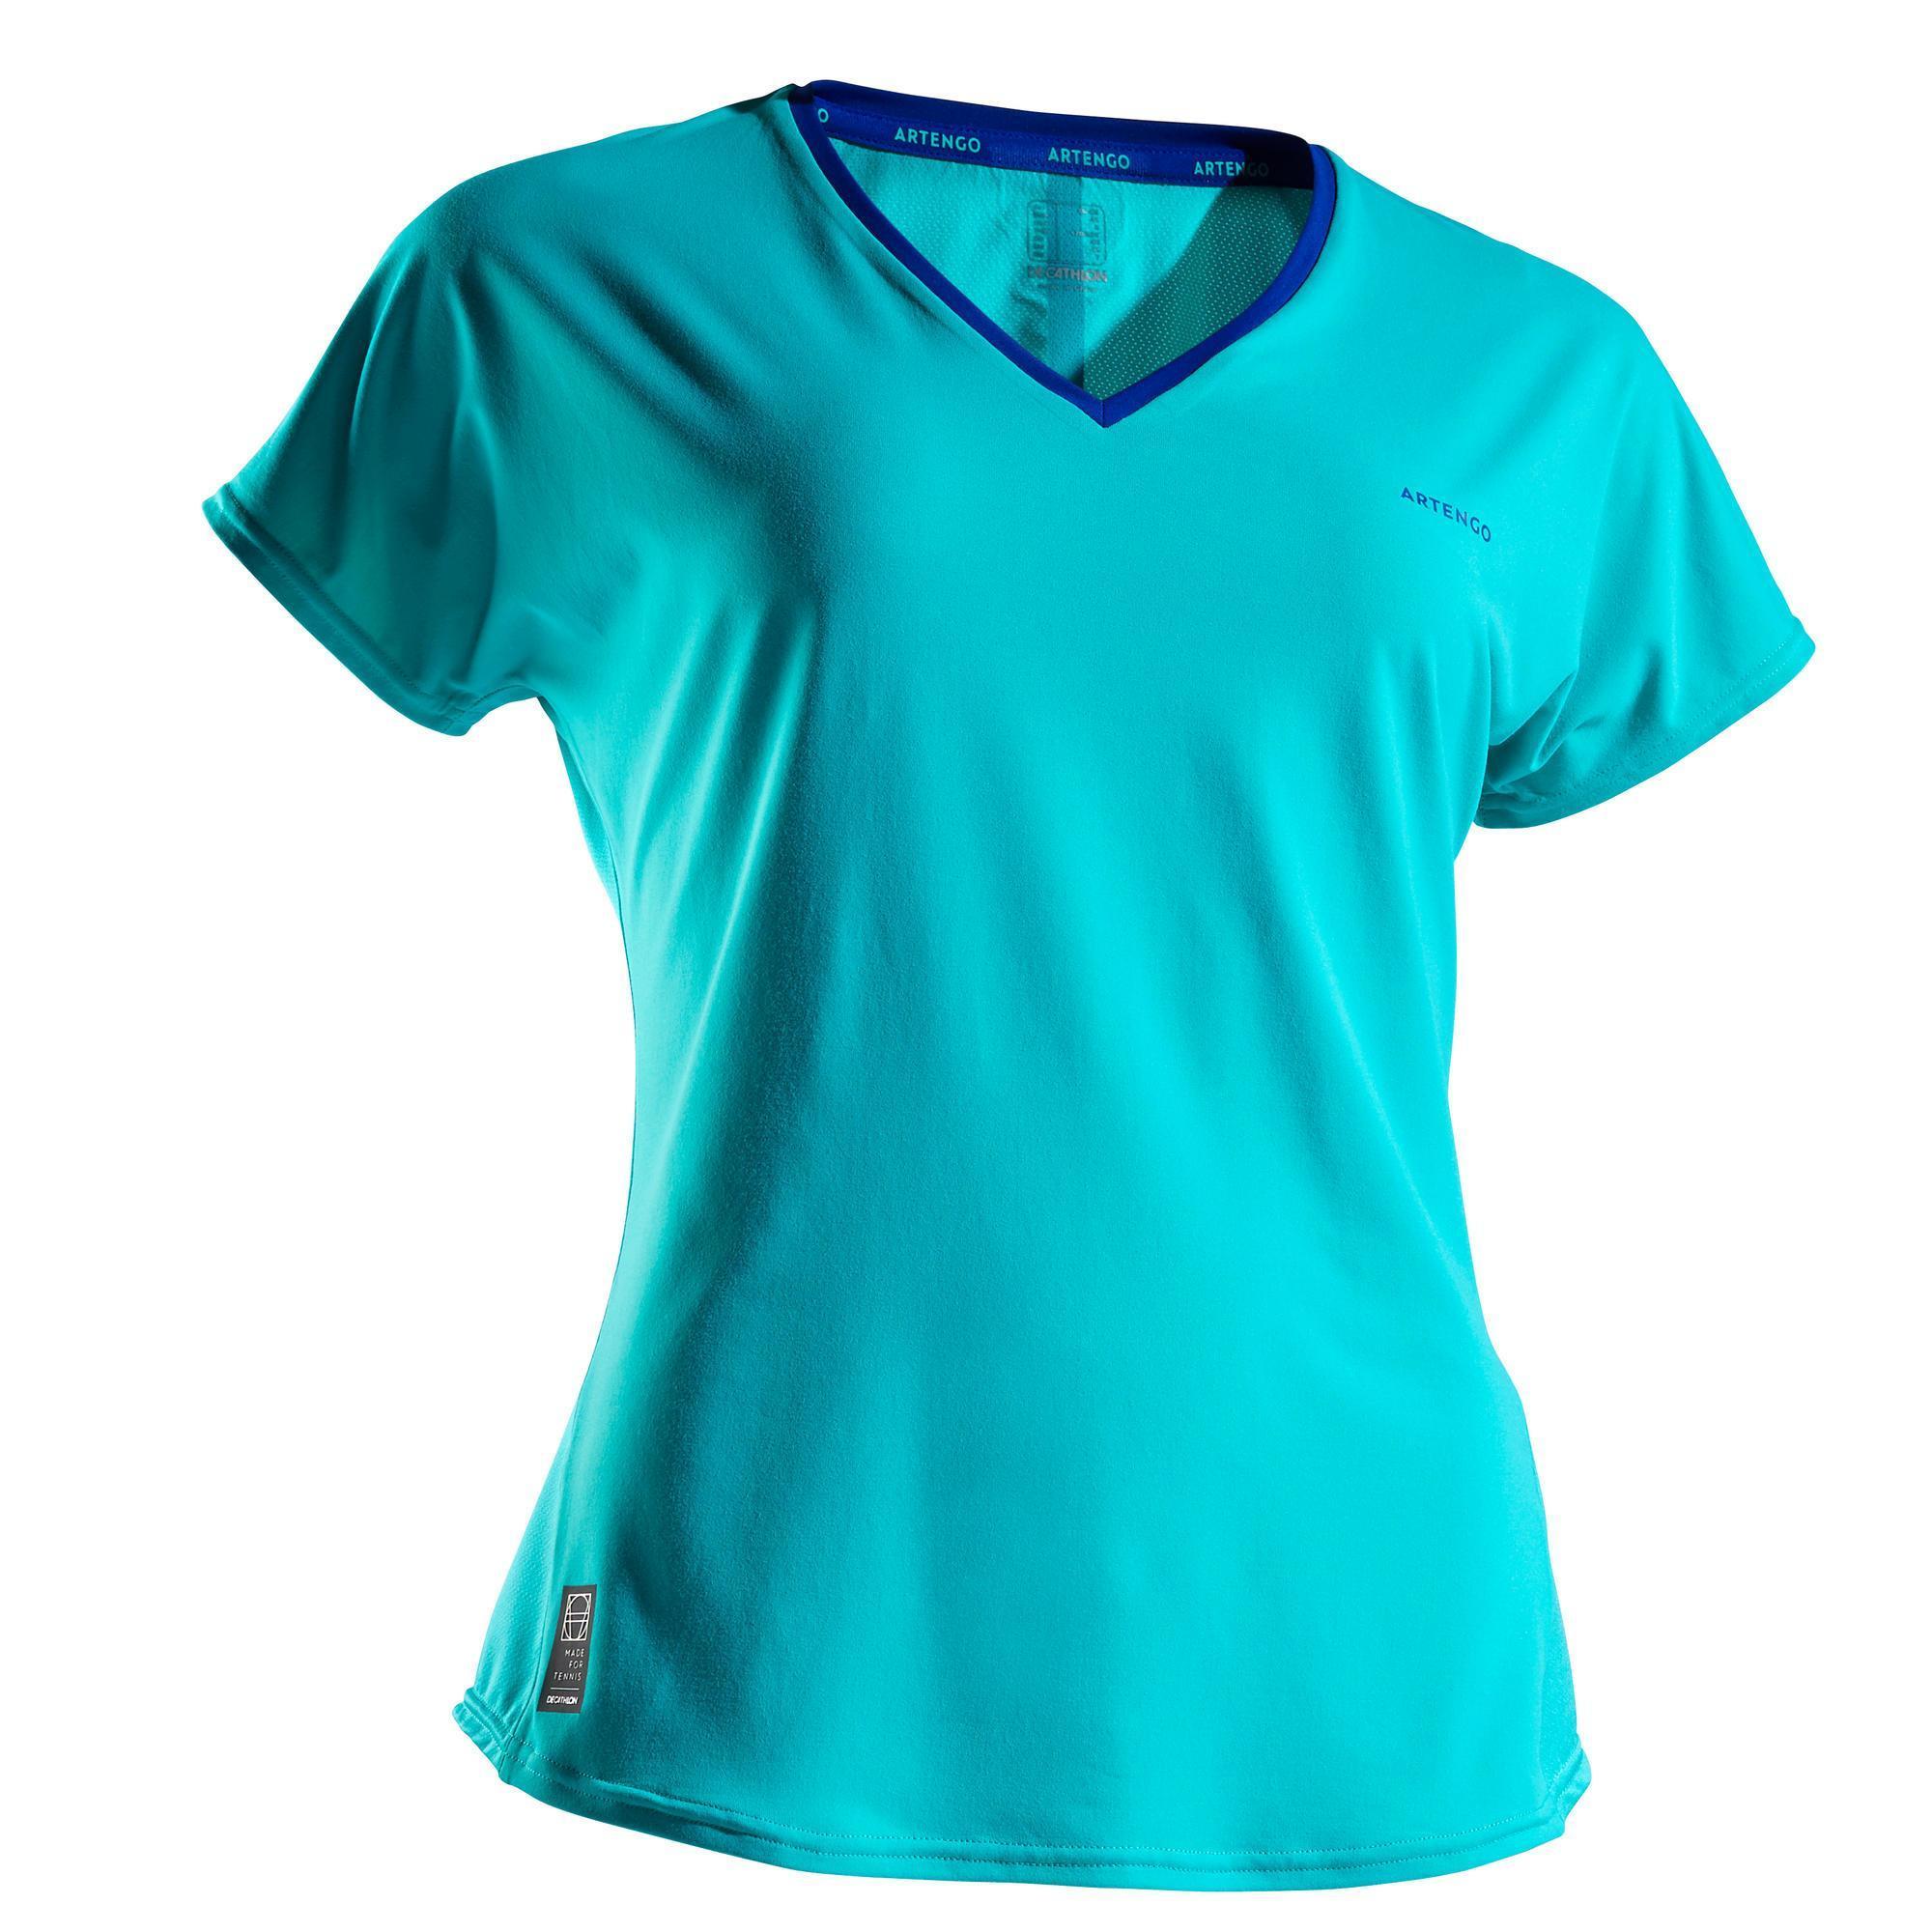 Tennis T-Shirt TS Soft 500 Damen | Sportbekleidung > Sportshirts > Tennisshirts | Artengo